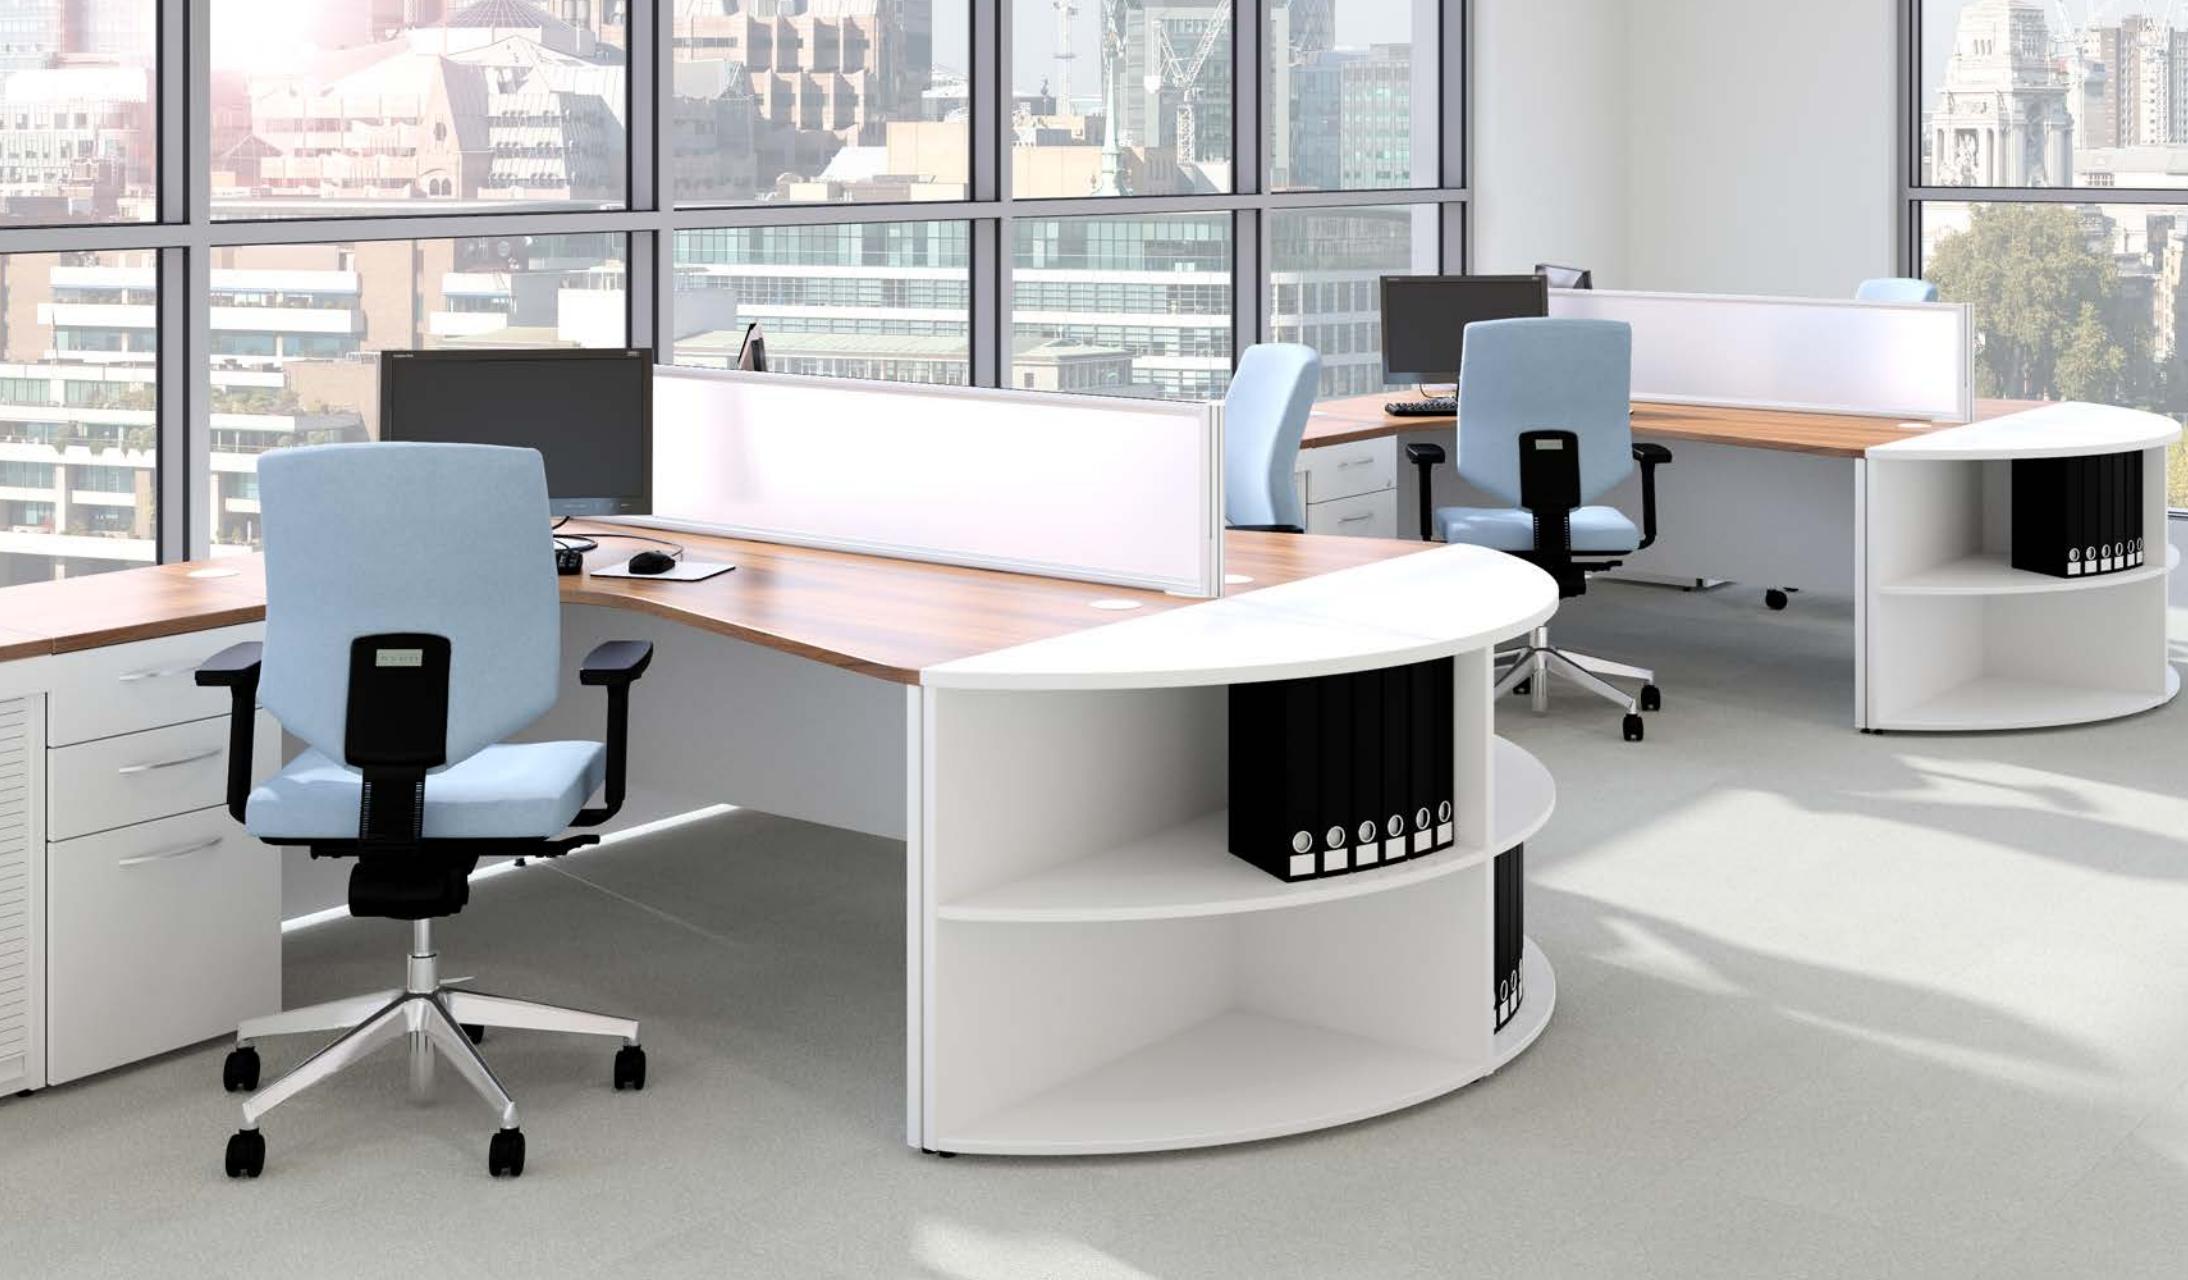 pin by amelia deacon on office furniture company uk pinterest rh pinterest com